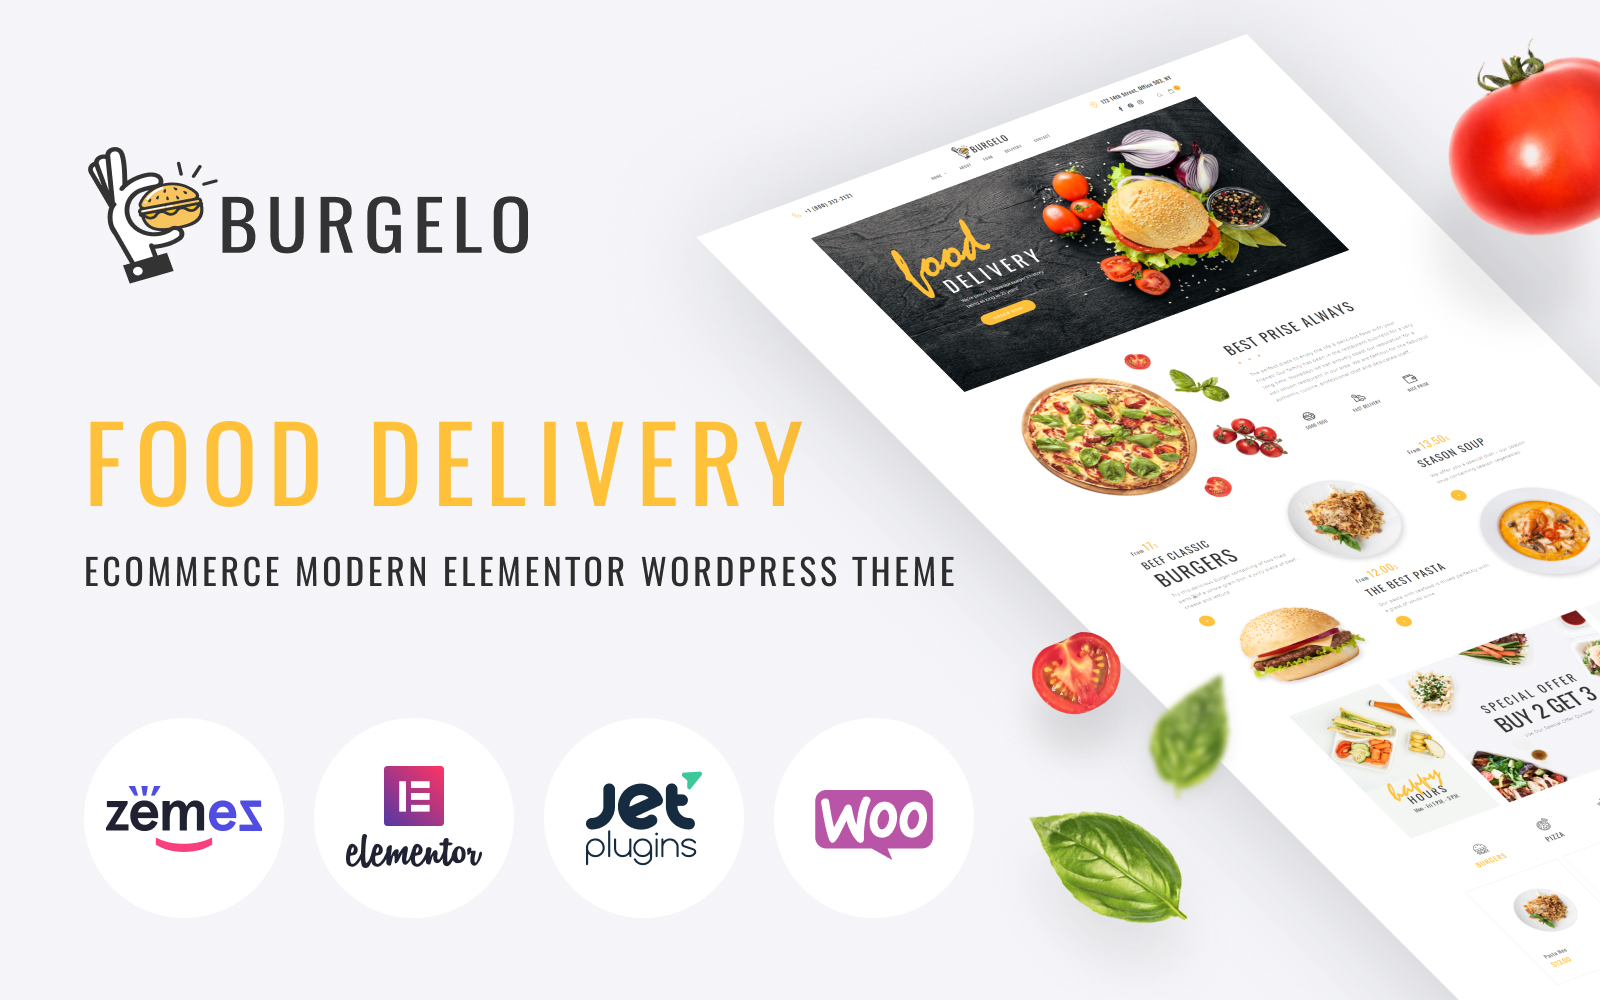 Responsive Burgelo - Food Delivery ECommerce Modern Elementor Woocommerce #82722